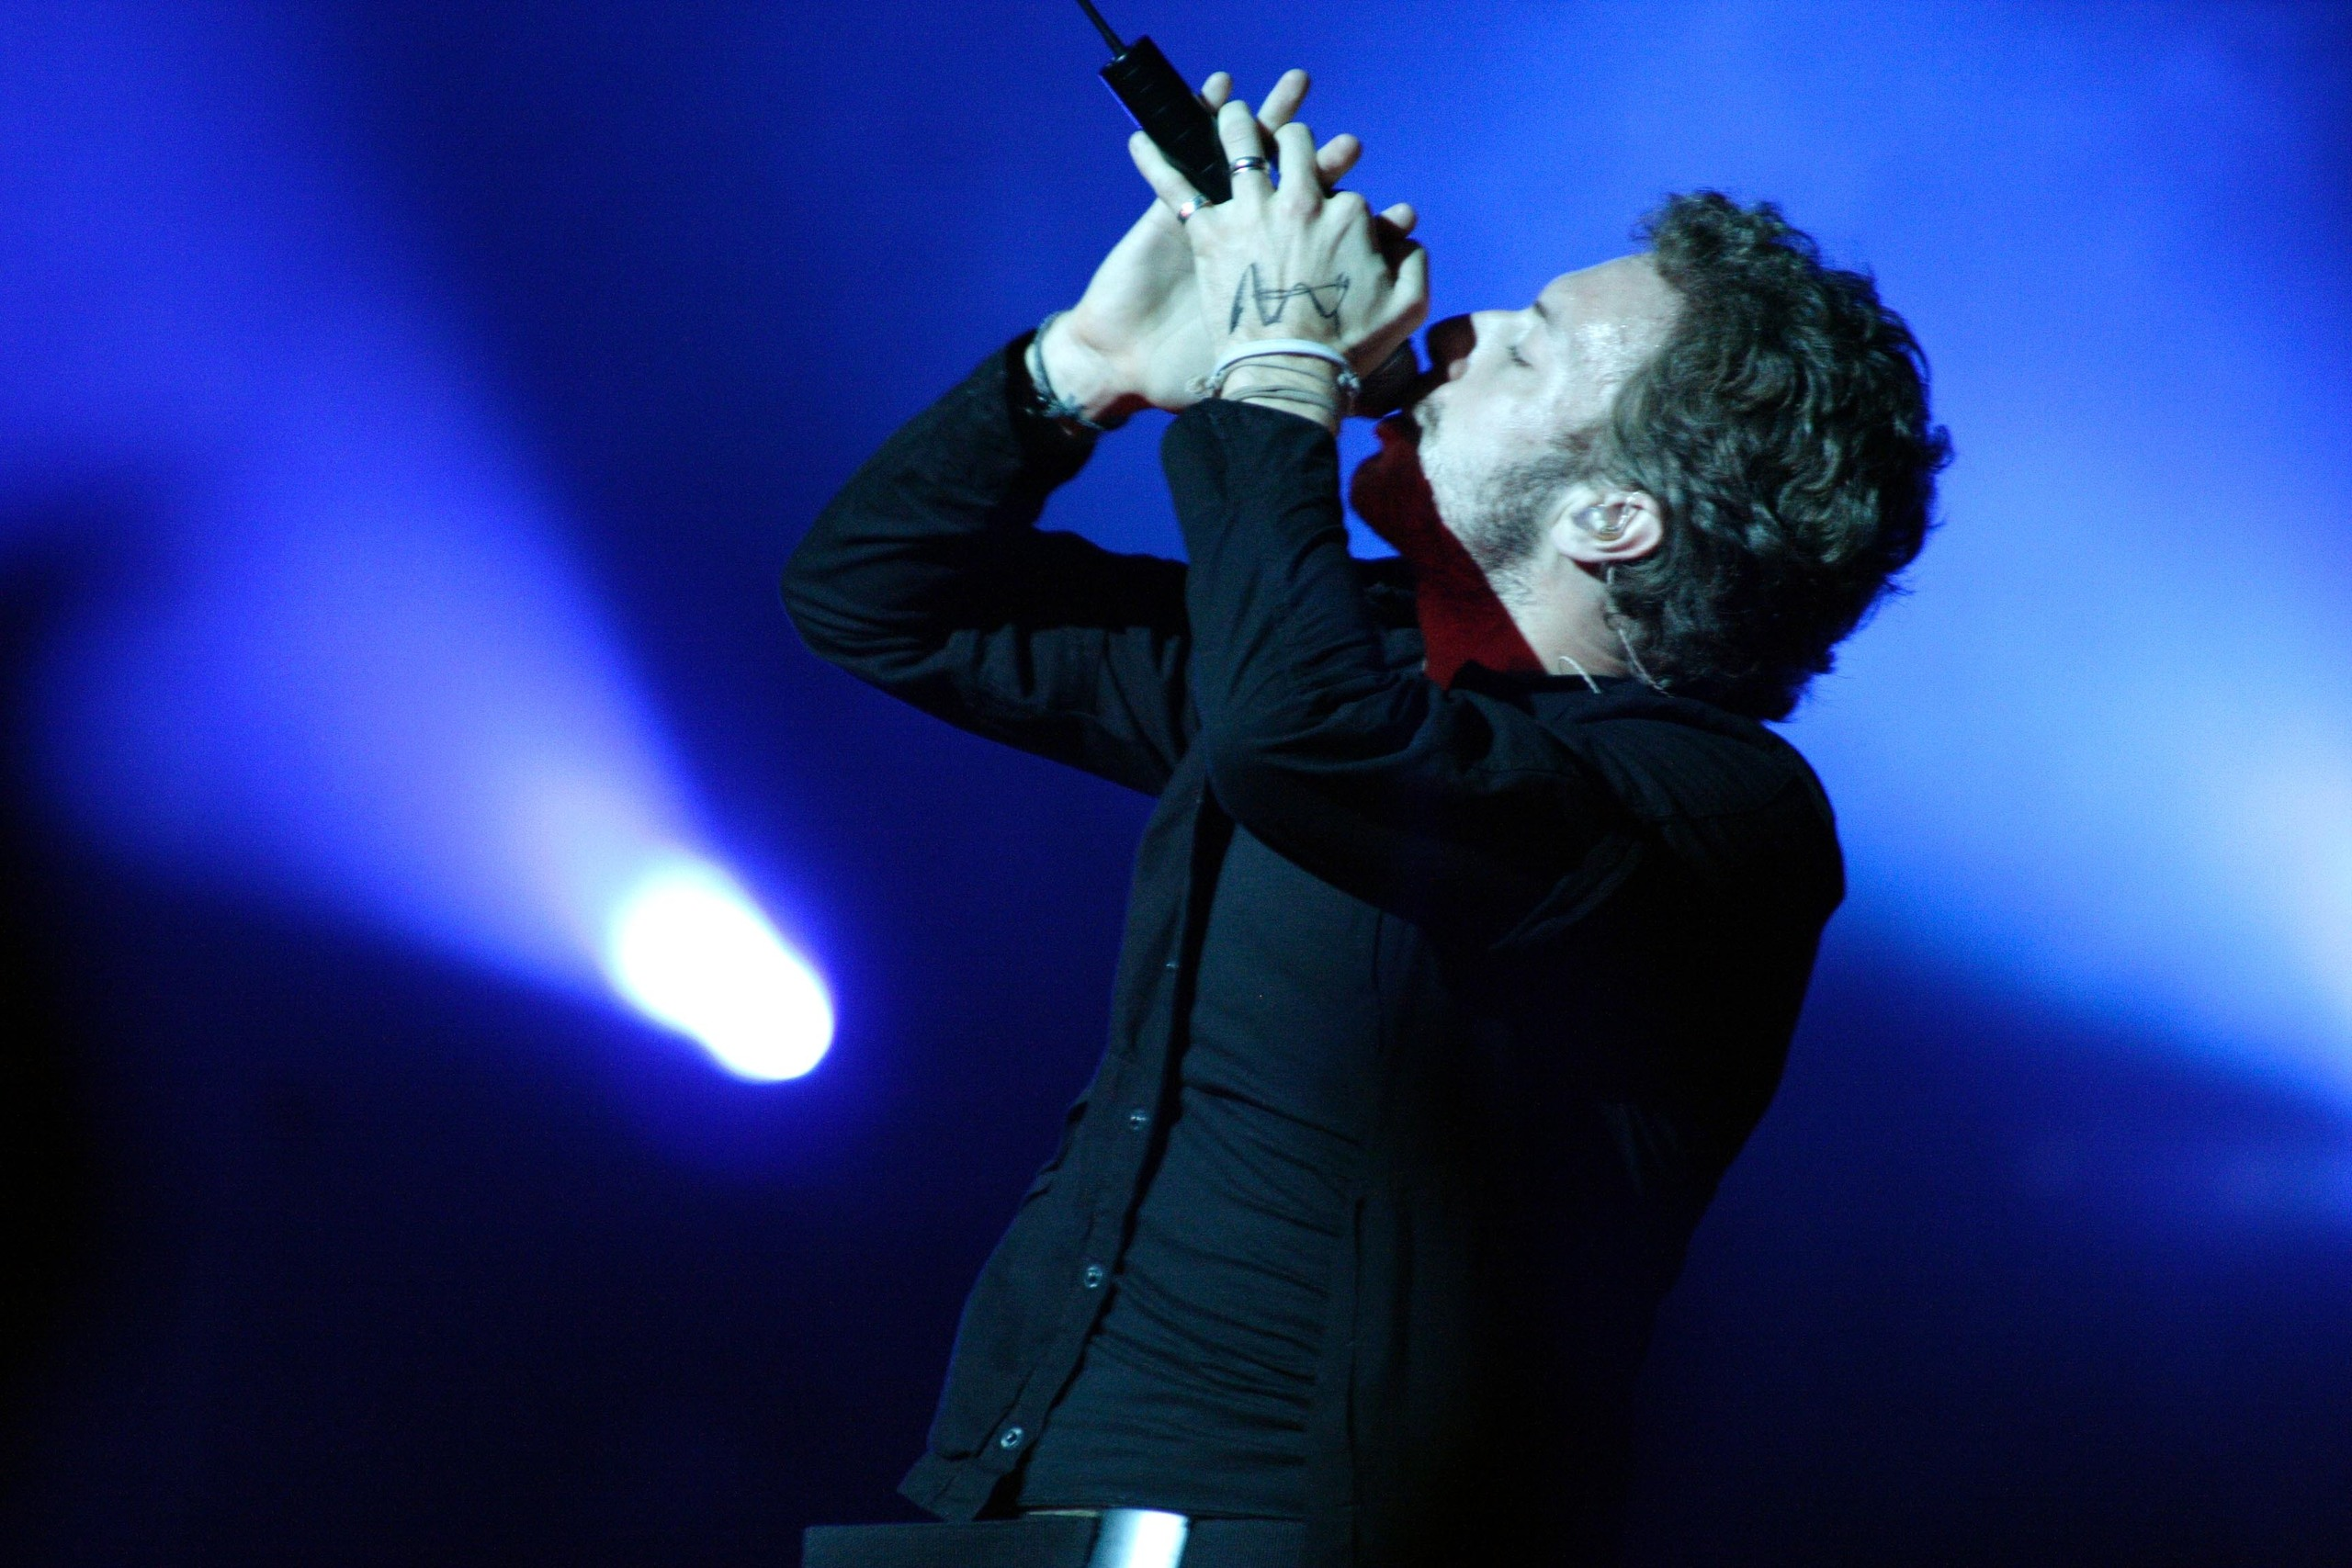 Live in sao paulo   Coldplay Photo 2523265 2560x1707